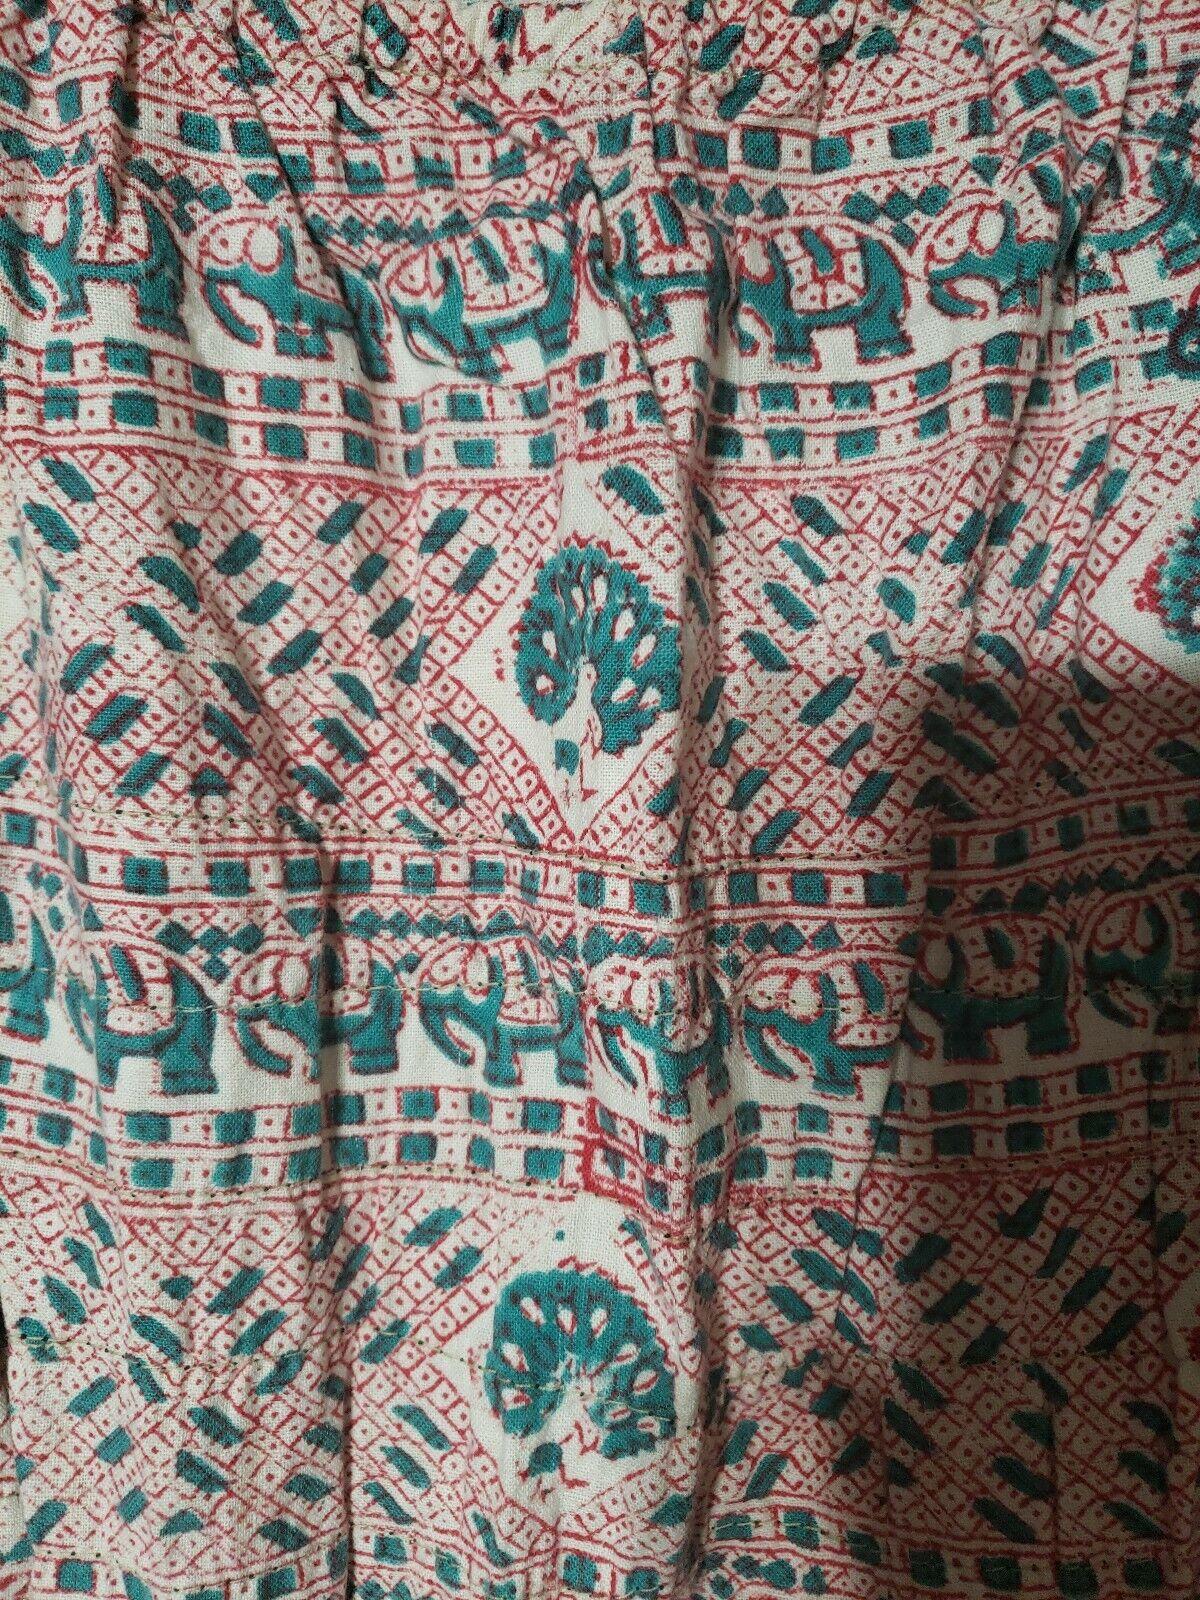 VINTAGE INDIA IMPORTS RHODE ISLAND 60S MAXI CAFTA… - image 4